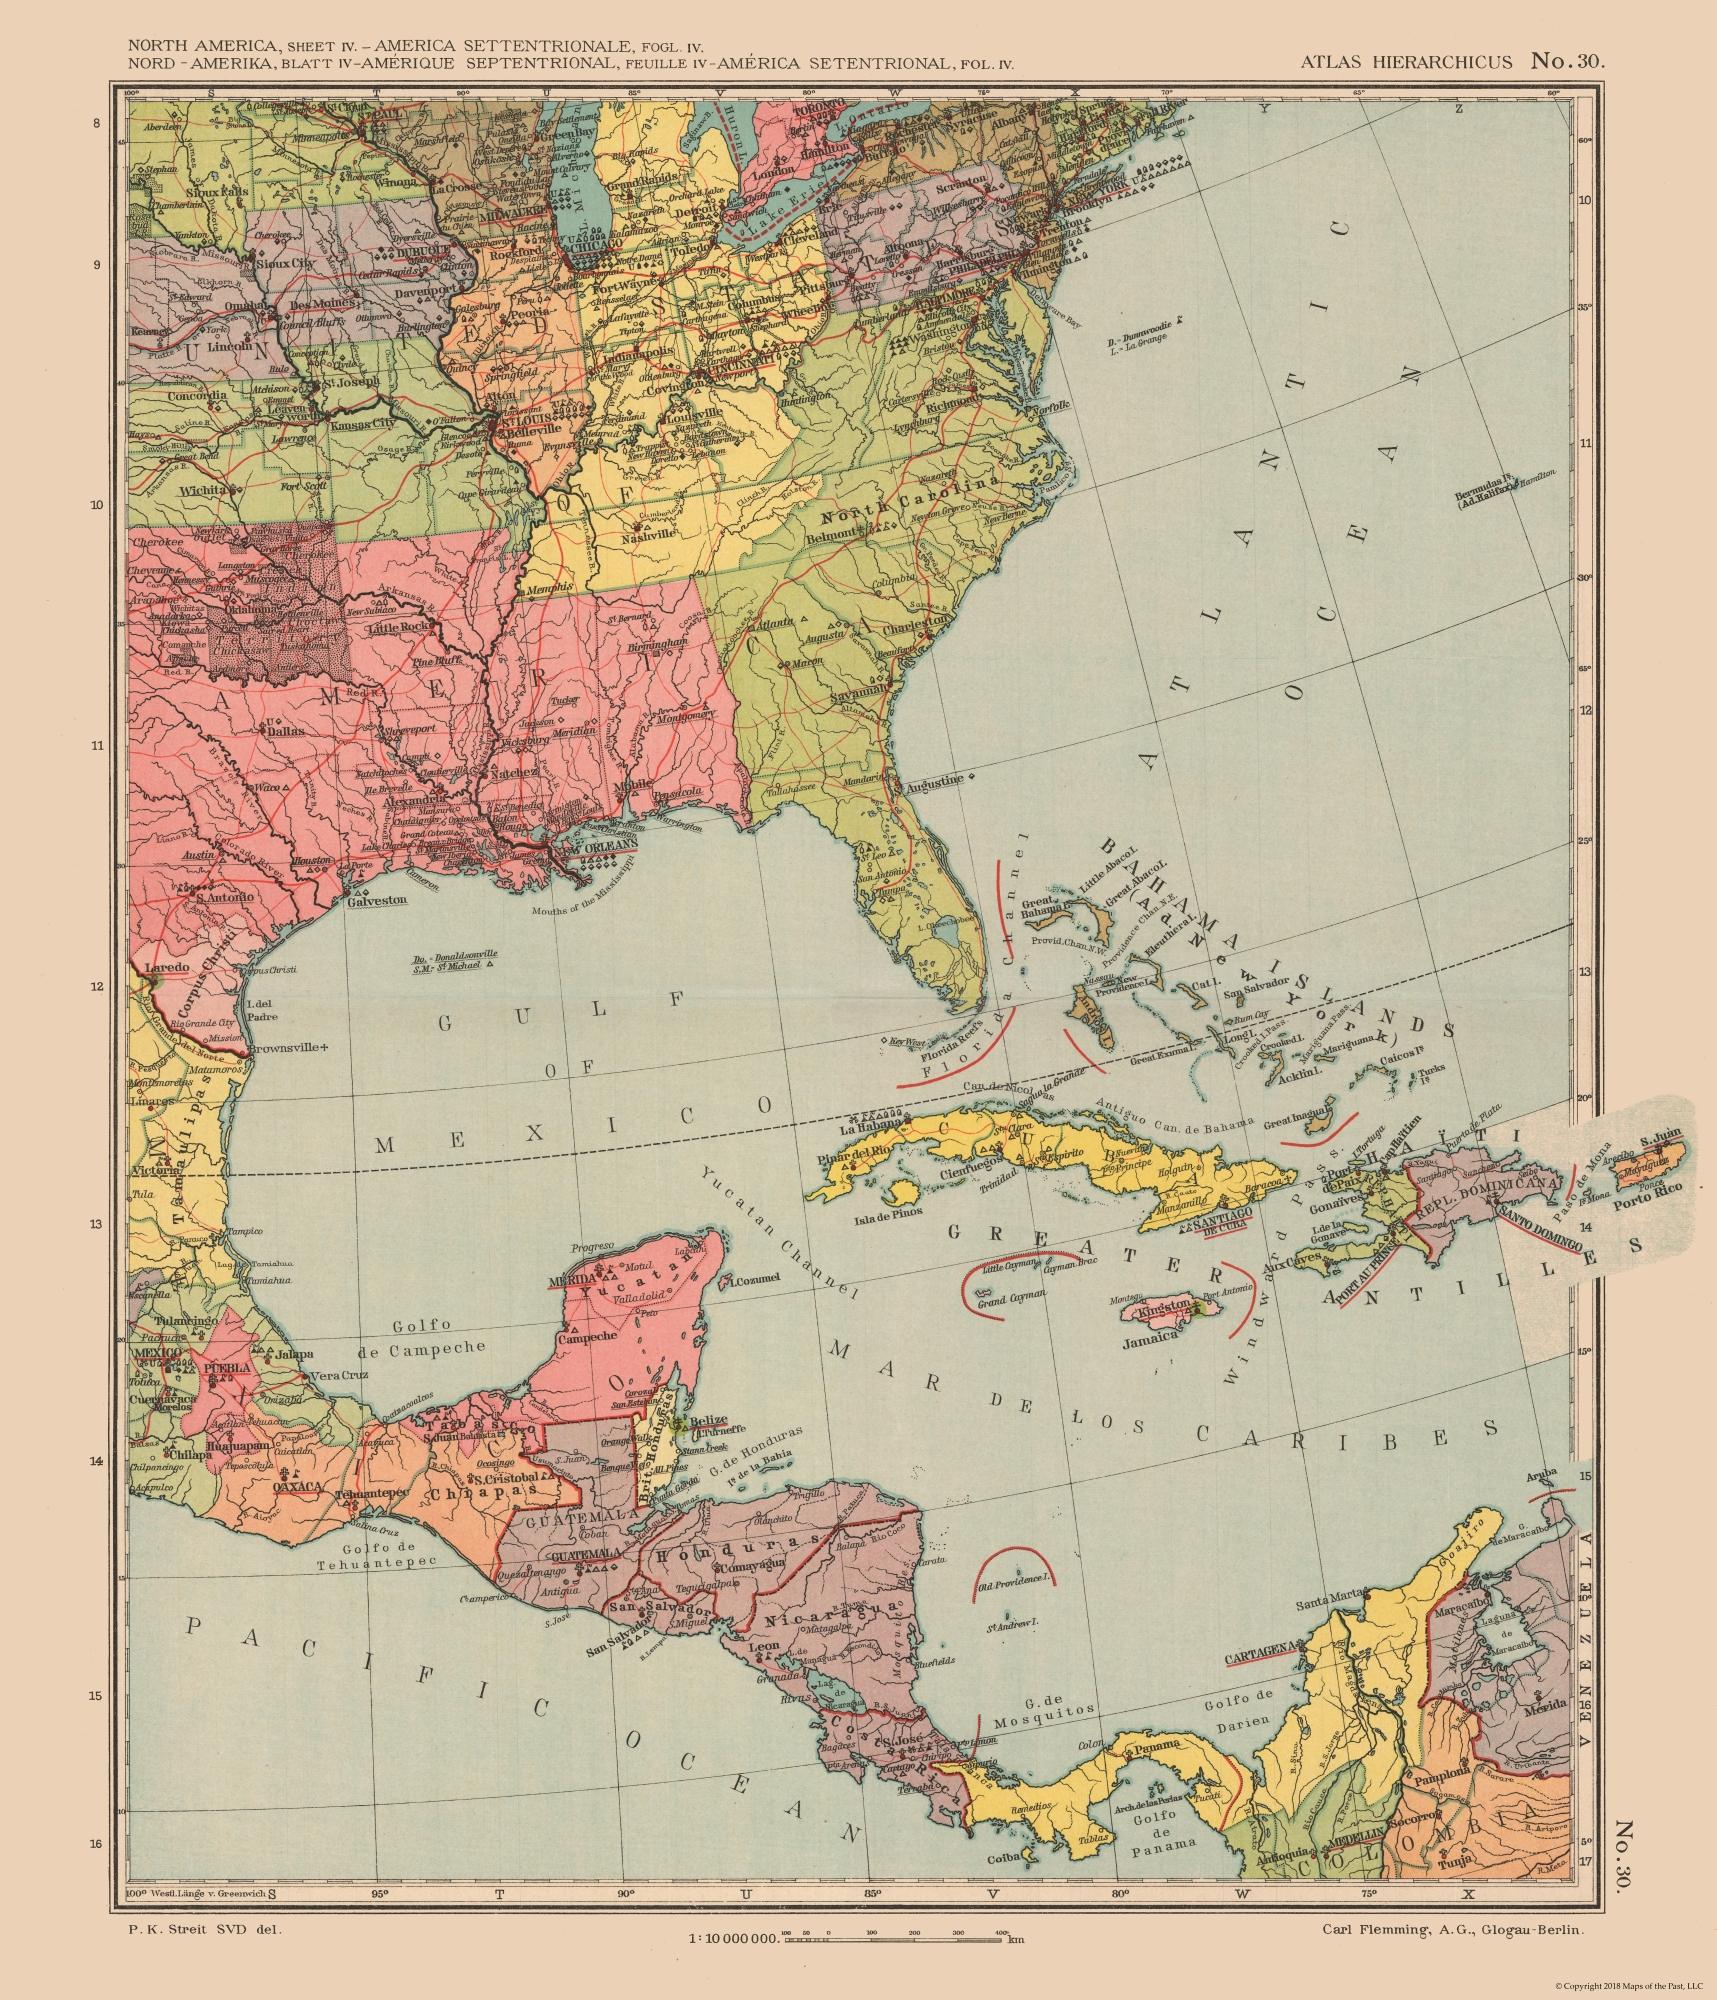 Old International Maps | United States, Central America - Streit\'s ...